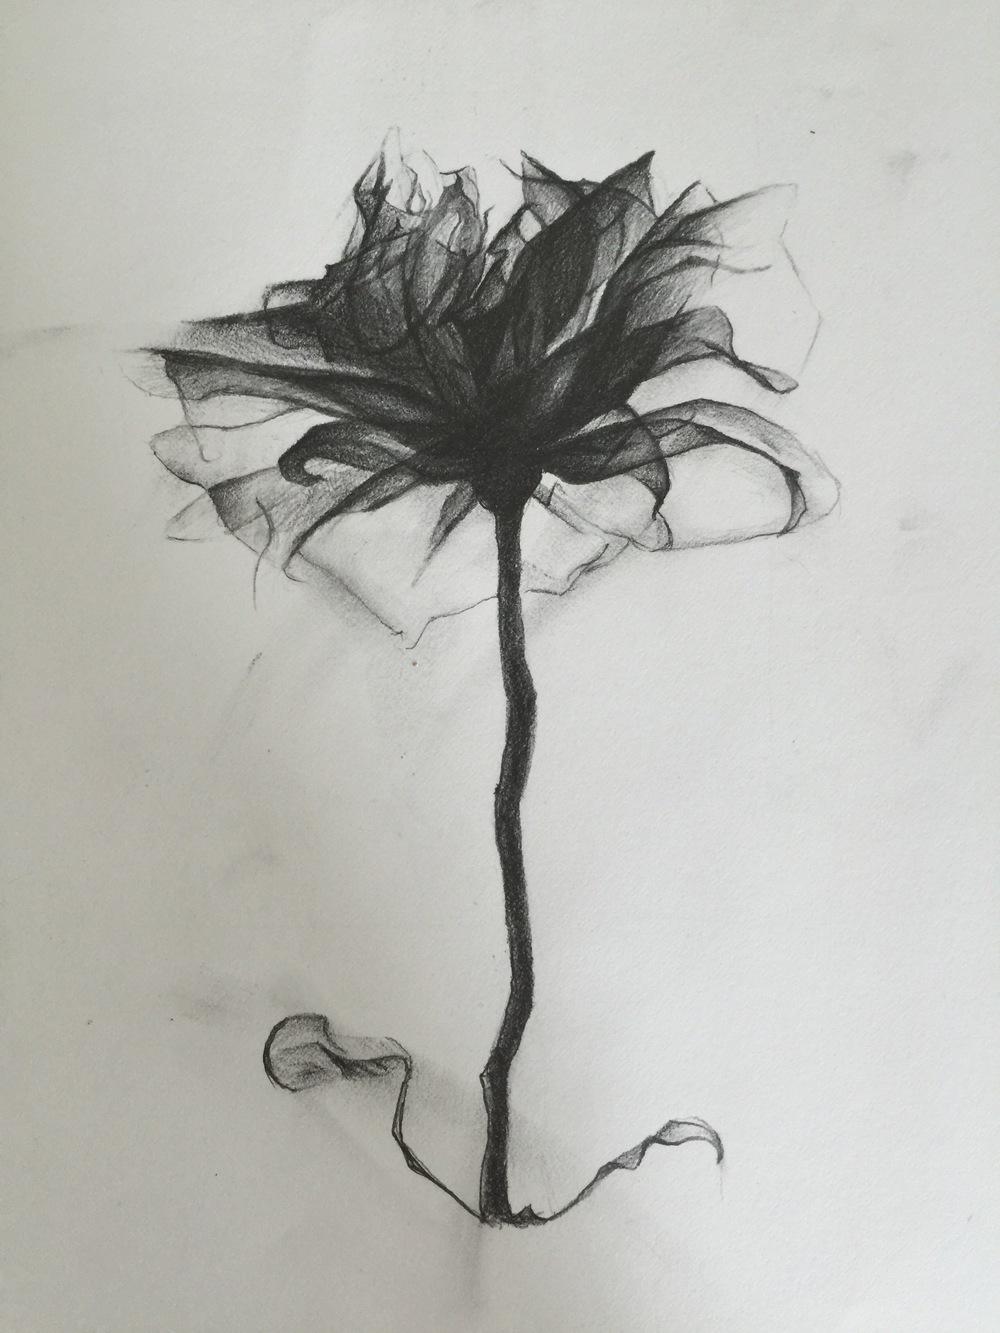 C-Thru(Sketch).jpg